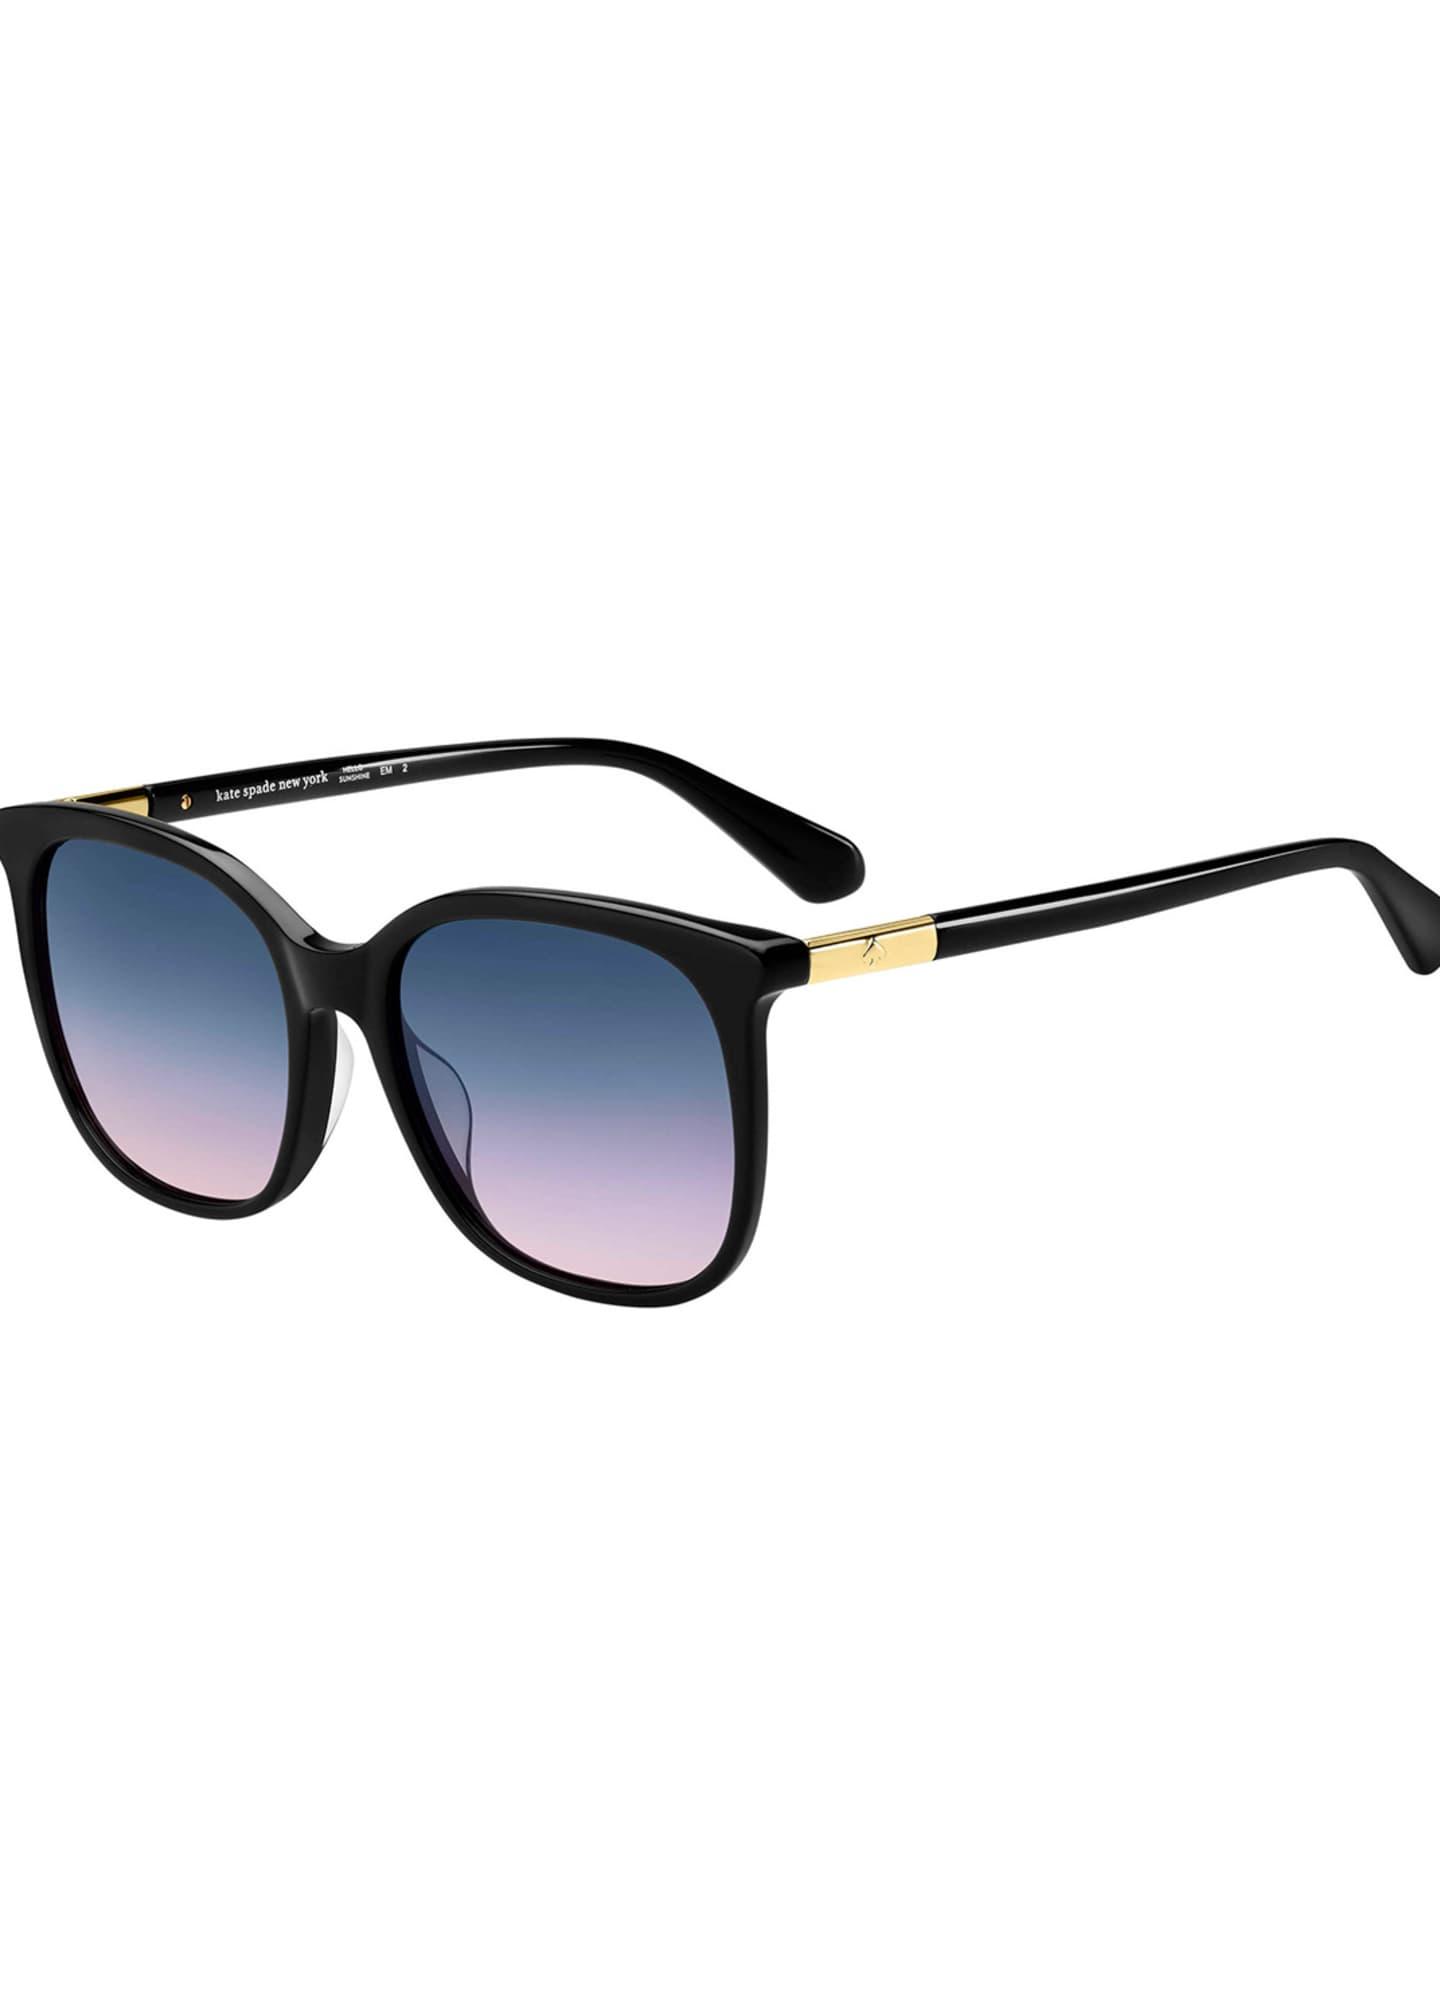 kate spade new york caylins square acetate sunglasses